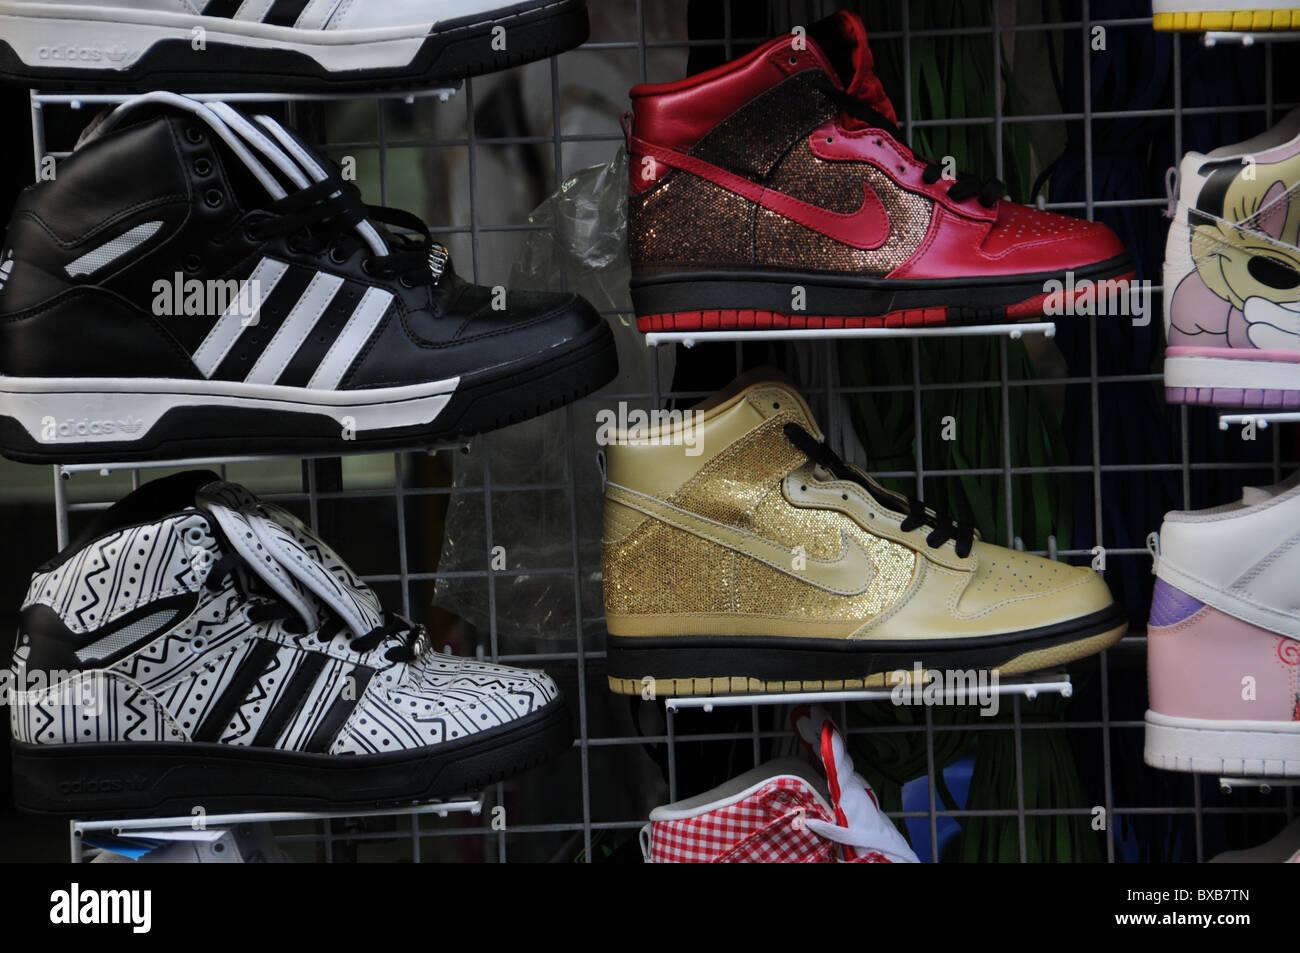 adidas fake shoes